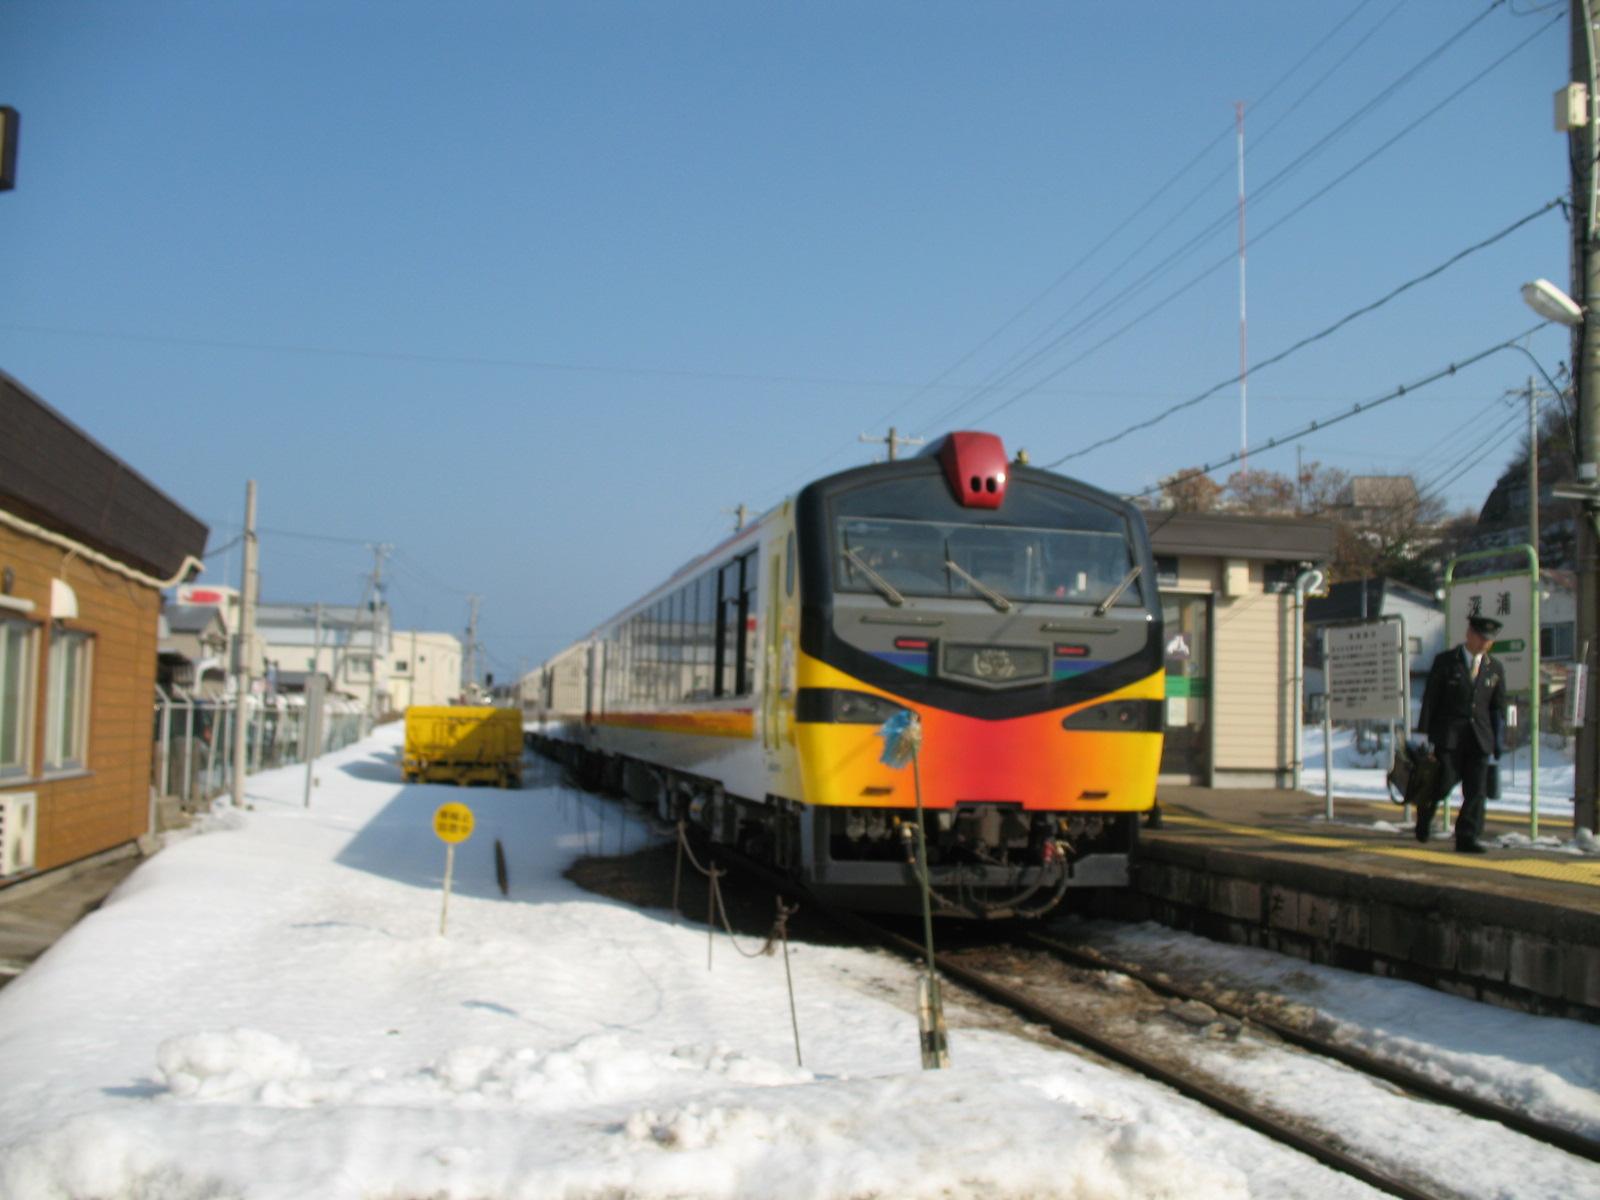 Trip to Tohoku and Nagano in 2013 winter – Part 4, from Akita to Hirosaki by Resort Shirakami